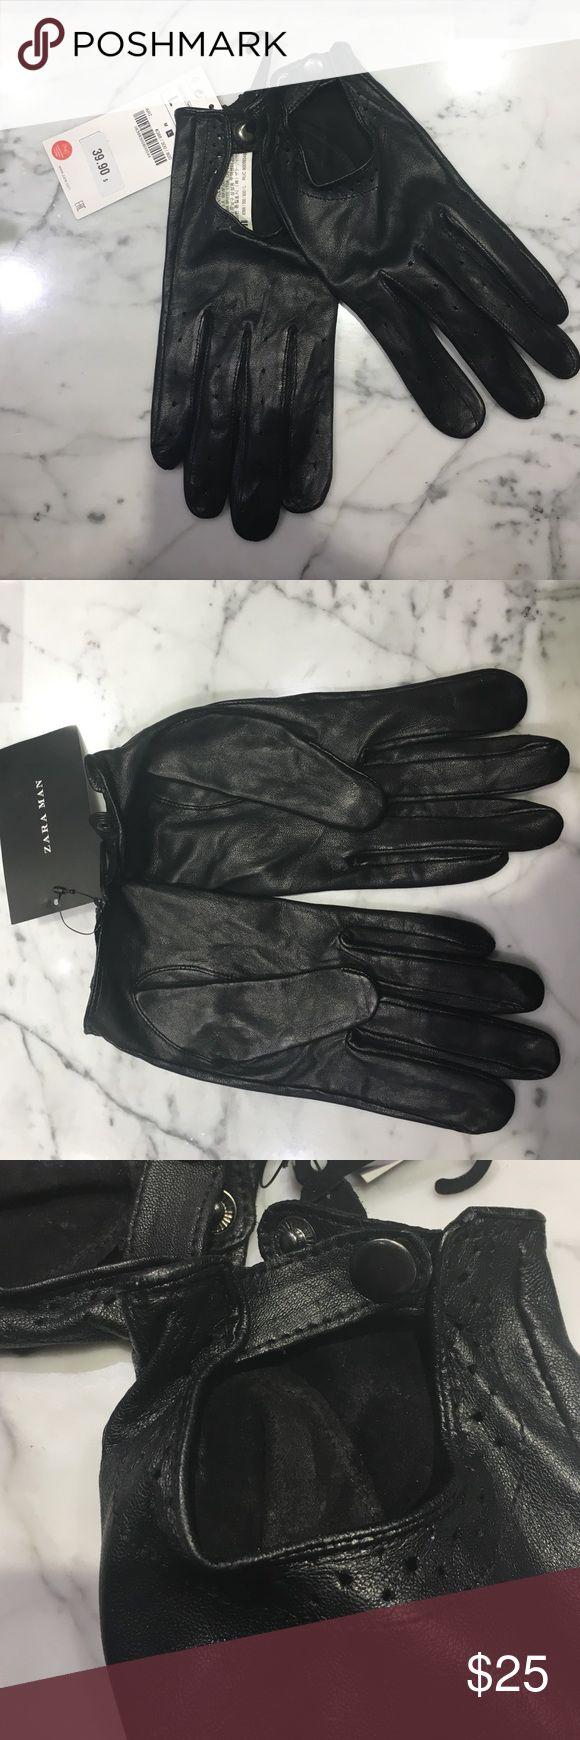 John varvatos leather driving gloves - Zara Man Driving Gloves Black Sheep Leather Driving Gloves Never Worn With Tags Zara